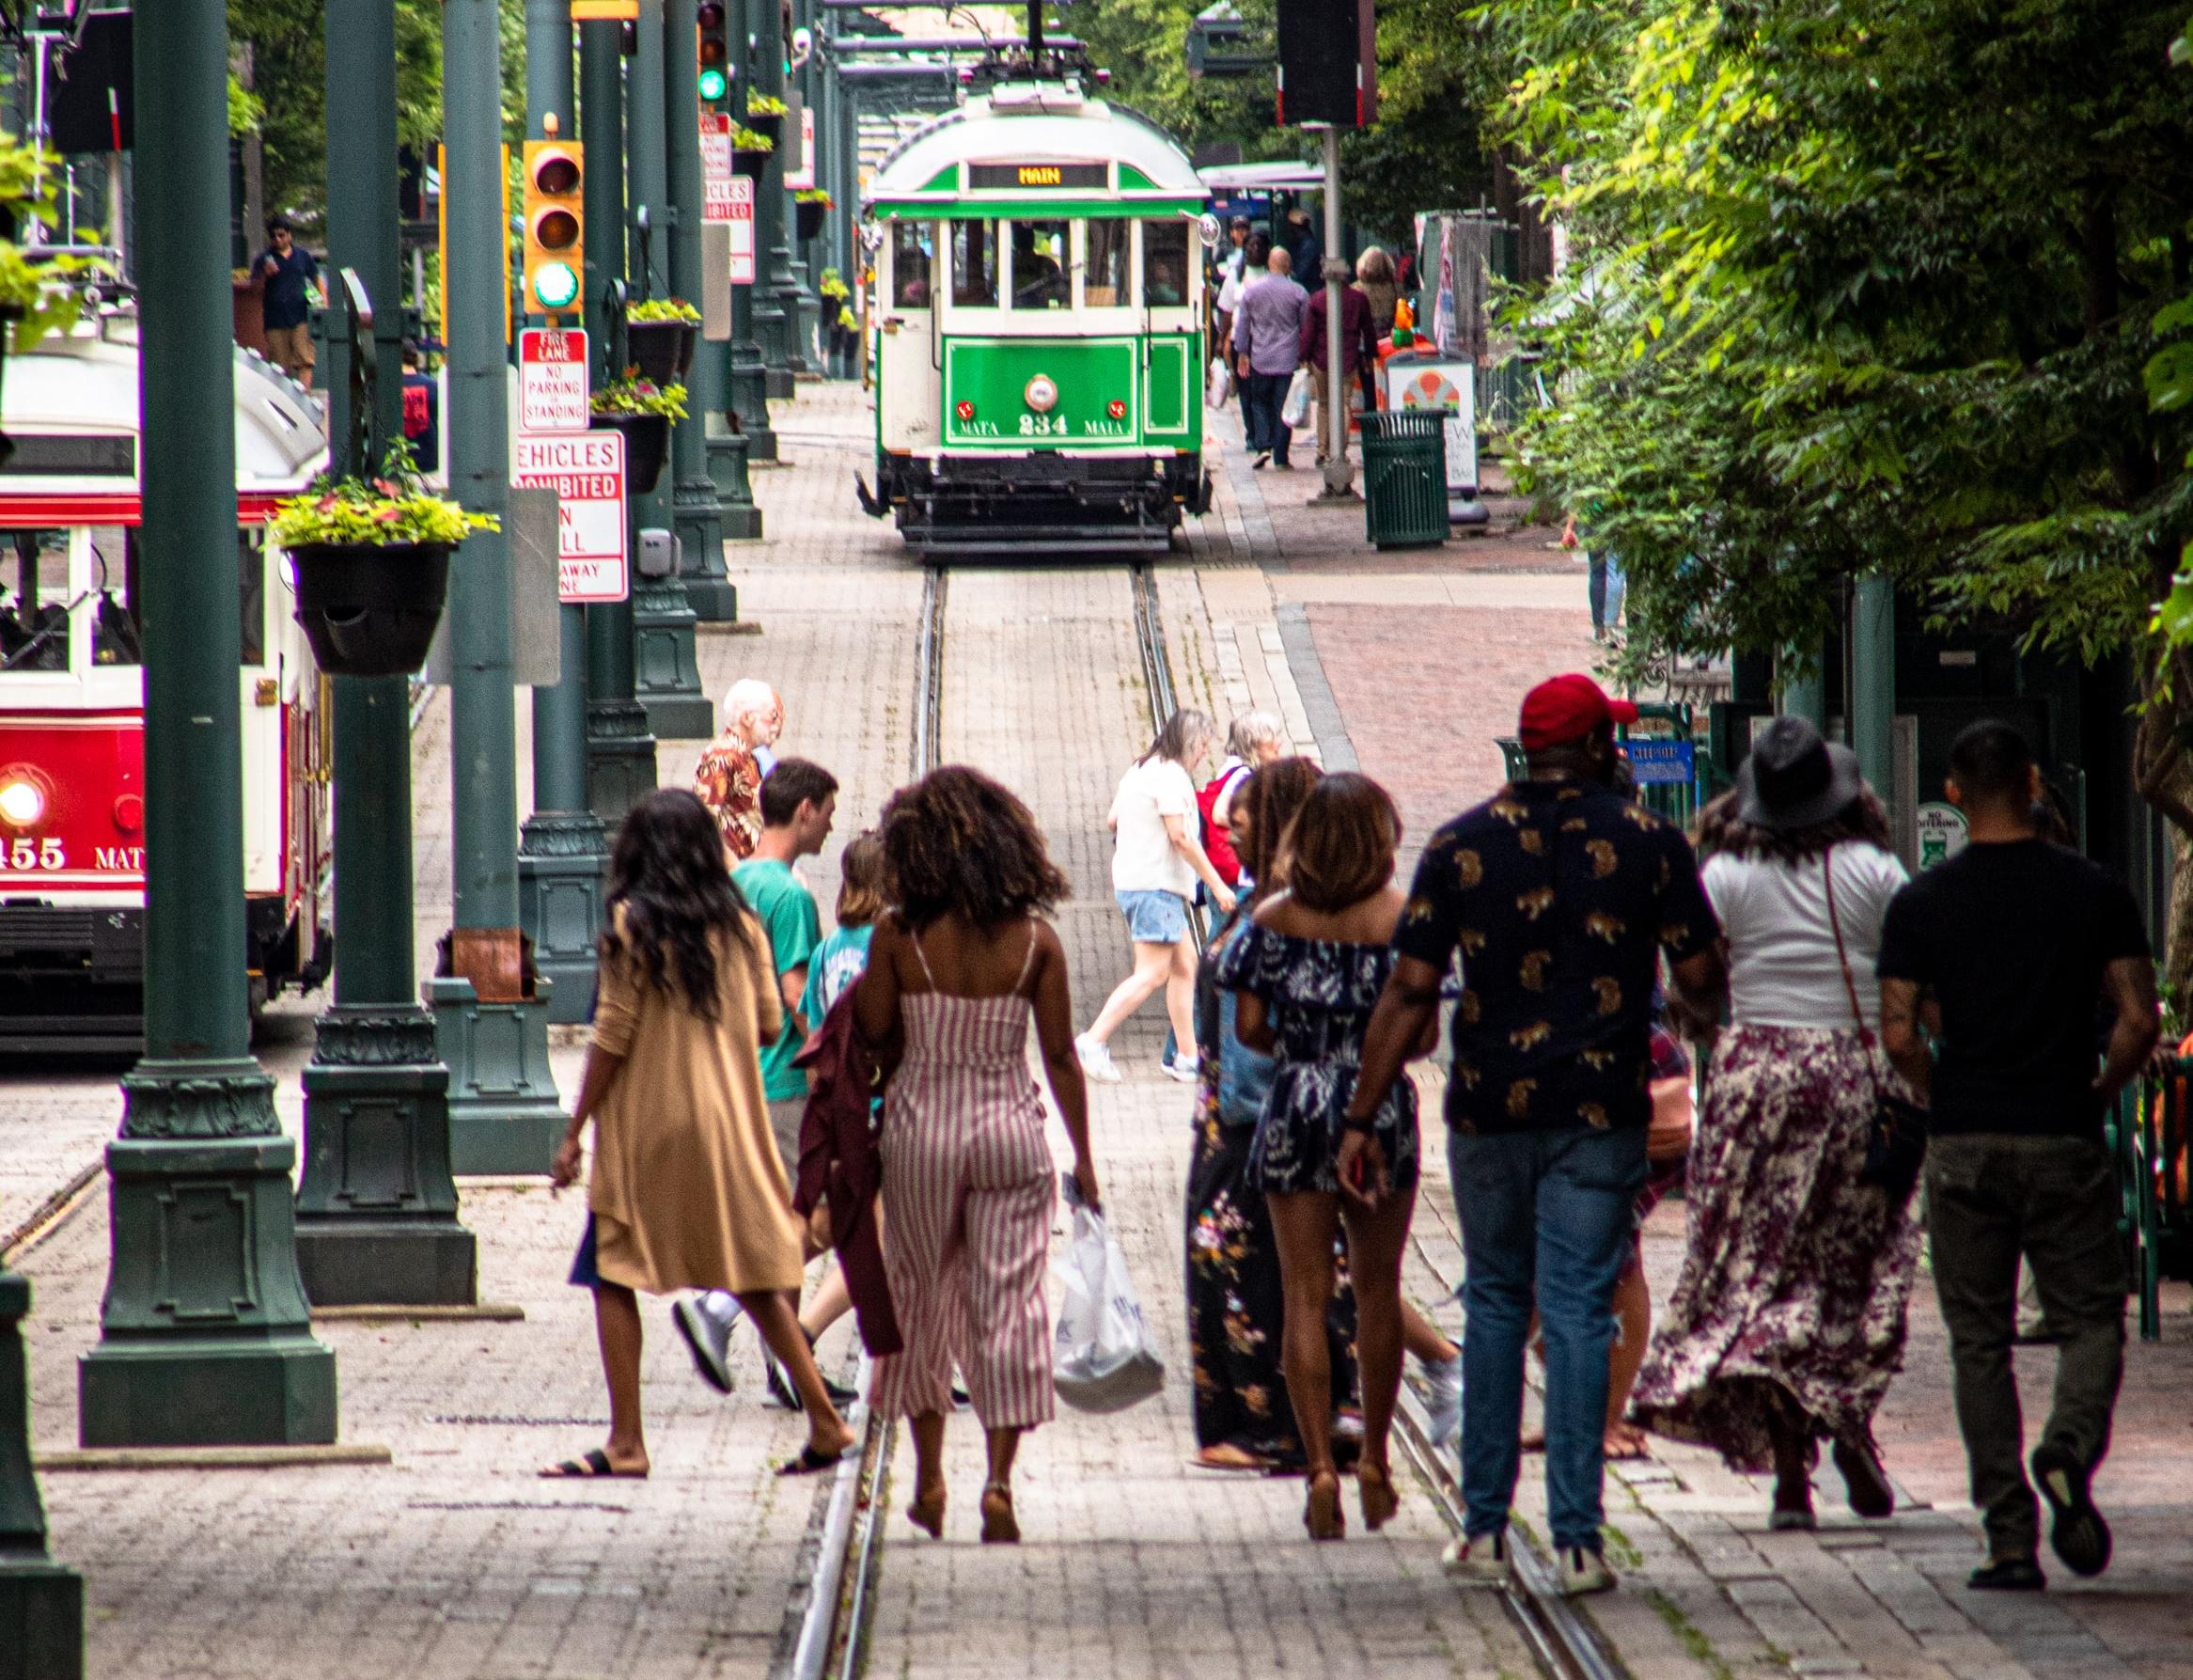 People walking on the tracks toward a streetcar in Memphis, TN, (Photo by Joshua J. Cotten / Unsplash)